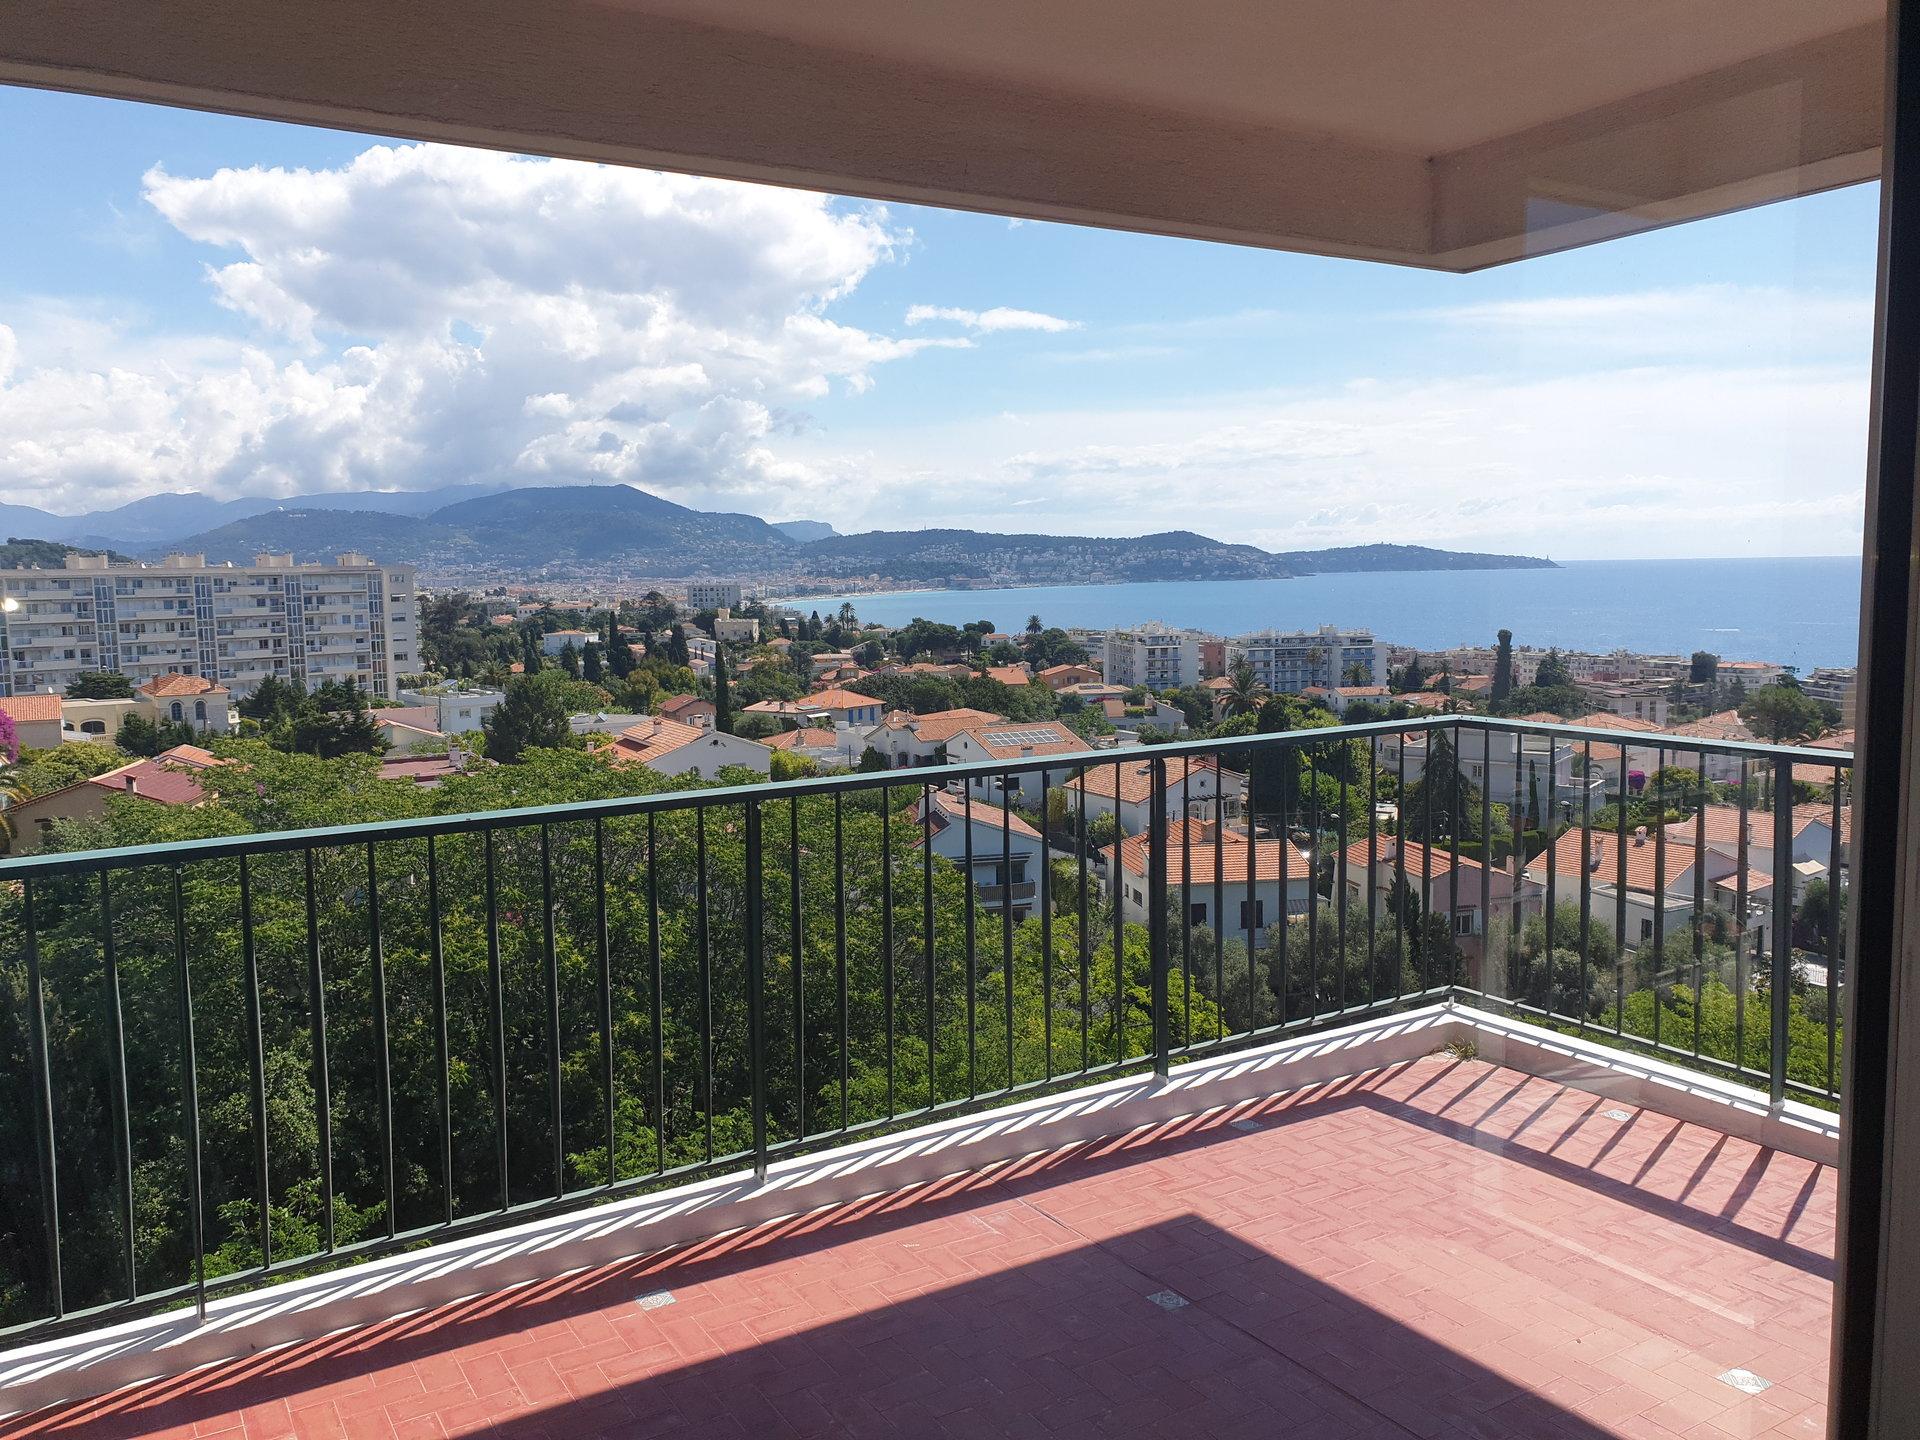 3 Pièces Nice, Vue Mer Panoramique, cadre exceptionel.